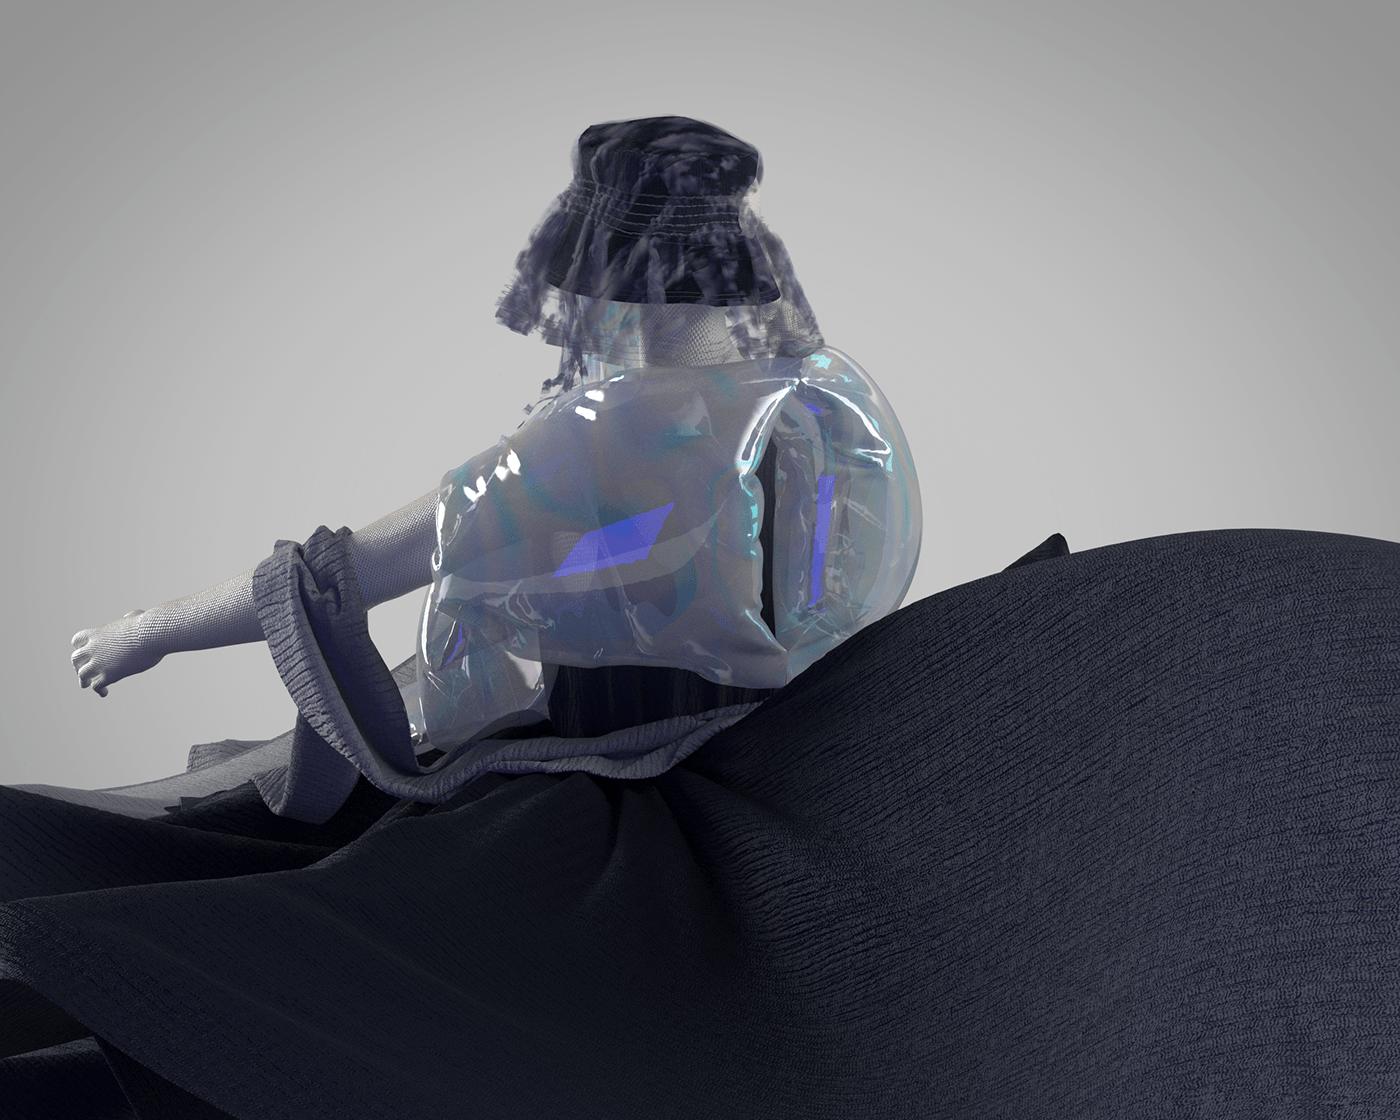 3D 3dart 3DArtist 3dfashion clo Clo3d digital digitalart Fashion  MarvelousDesigner